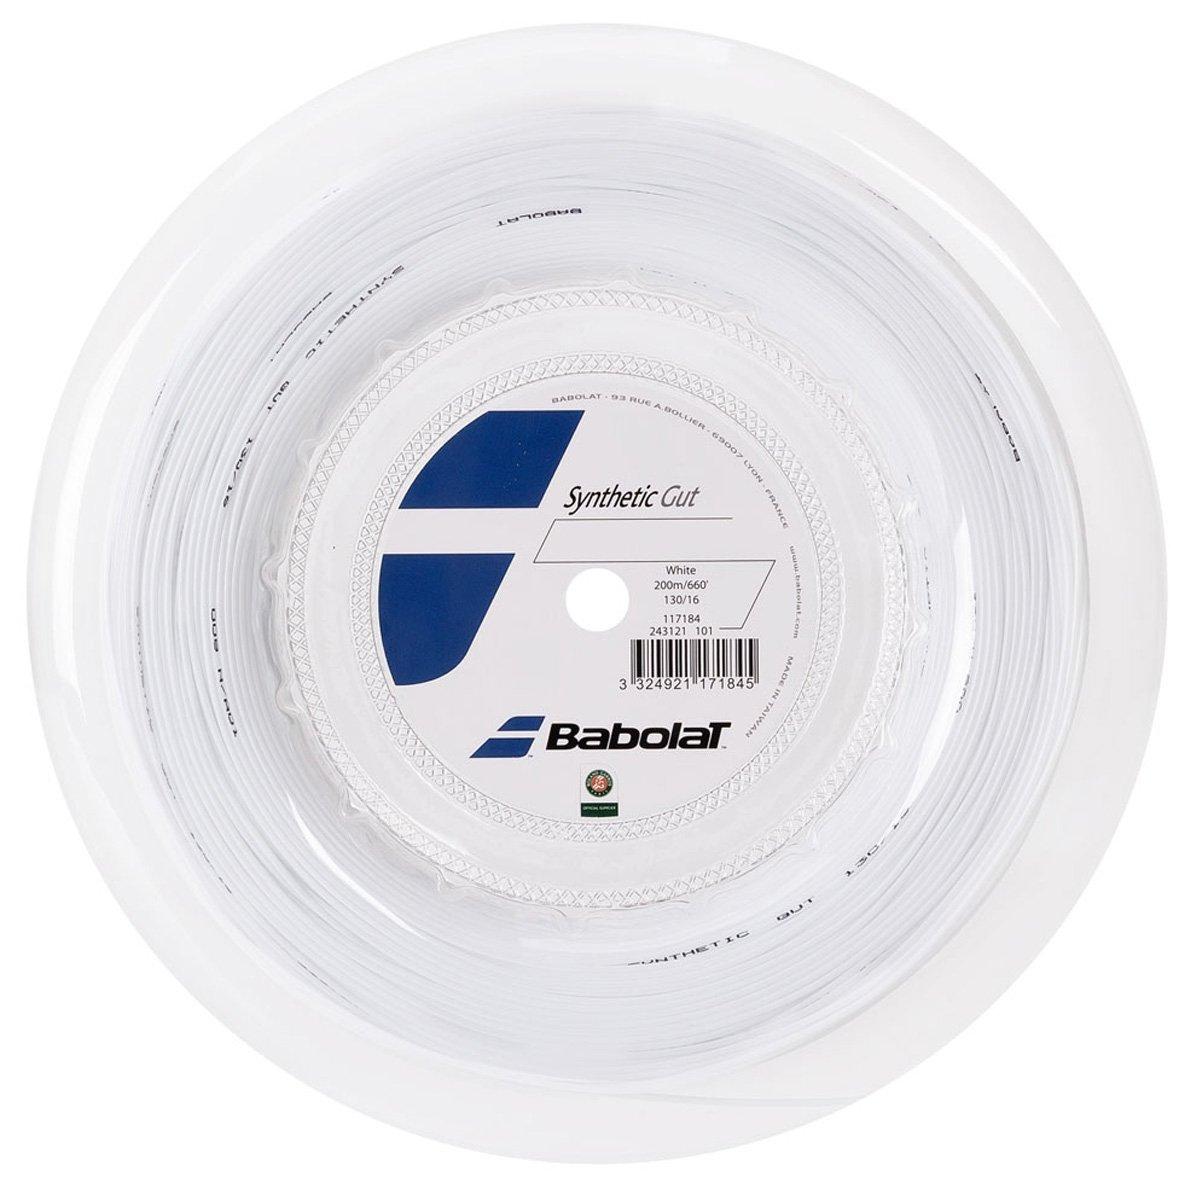 Corda Babolat Synthetic Gut 16 1.30mm Branco - Rolo com 200m  - PROTENISTA